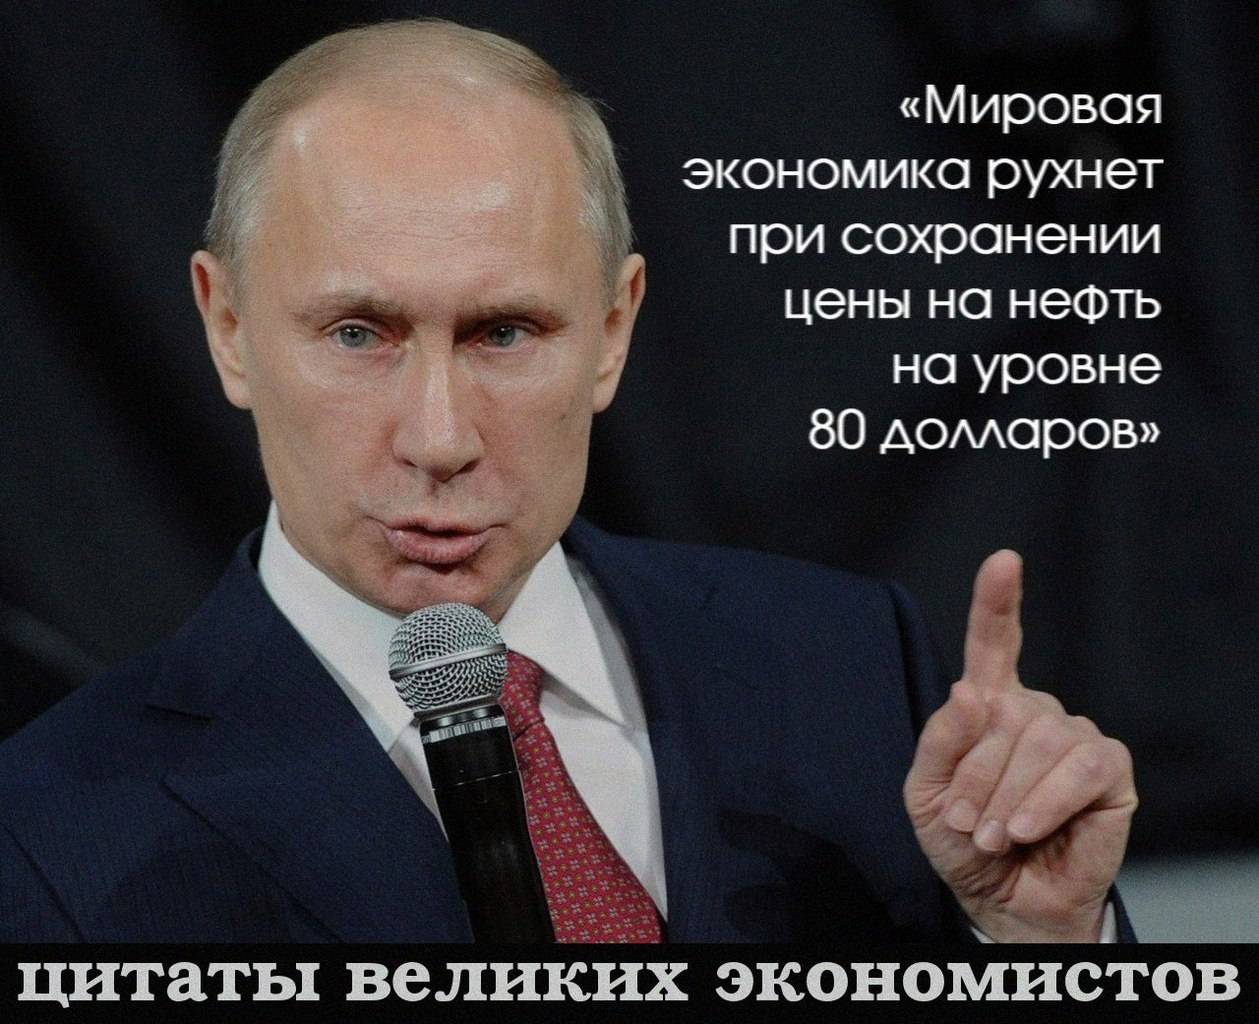 mirovaja_ekonomika_ruhnet_pri_cene_na_neft_80_dollarov_-_putin_20150126014302